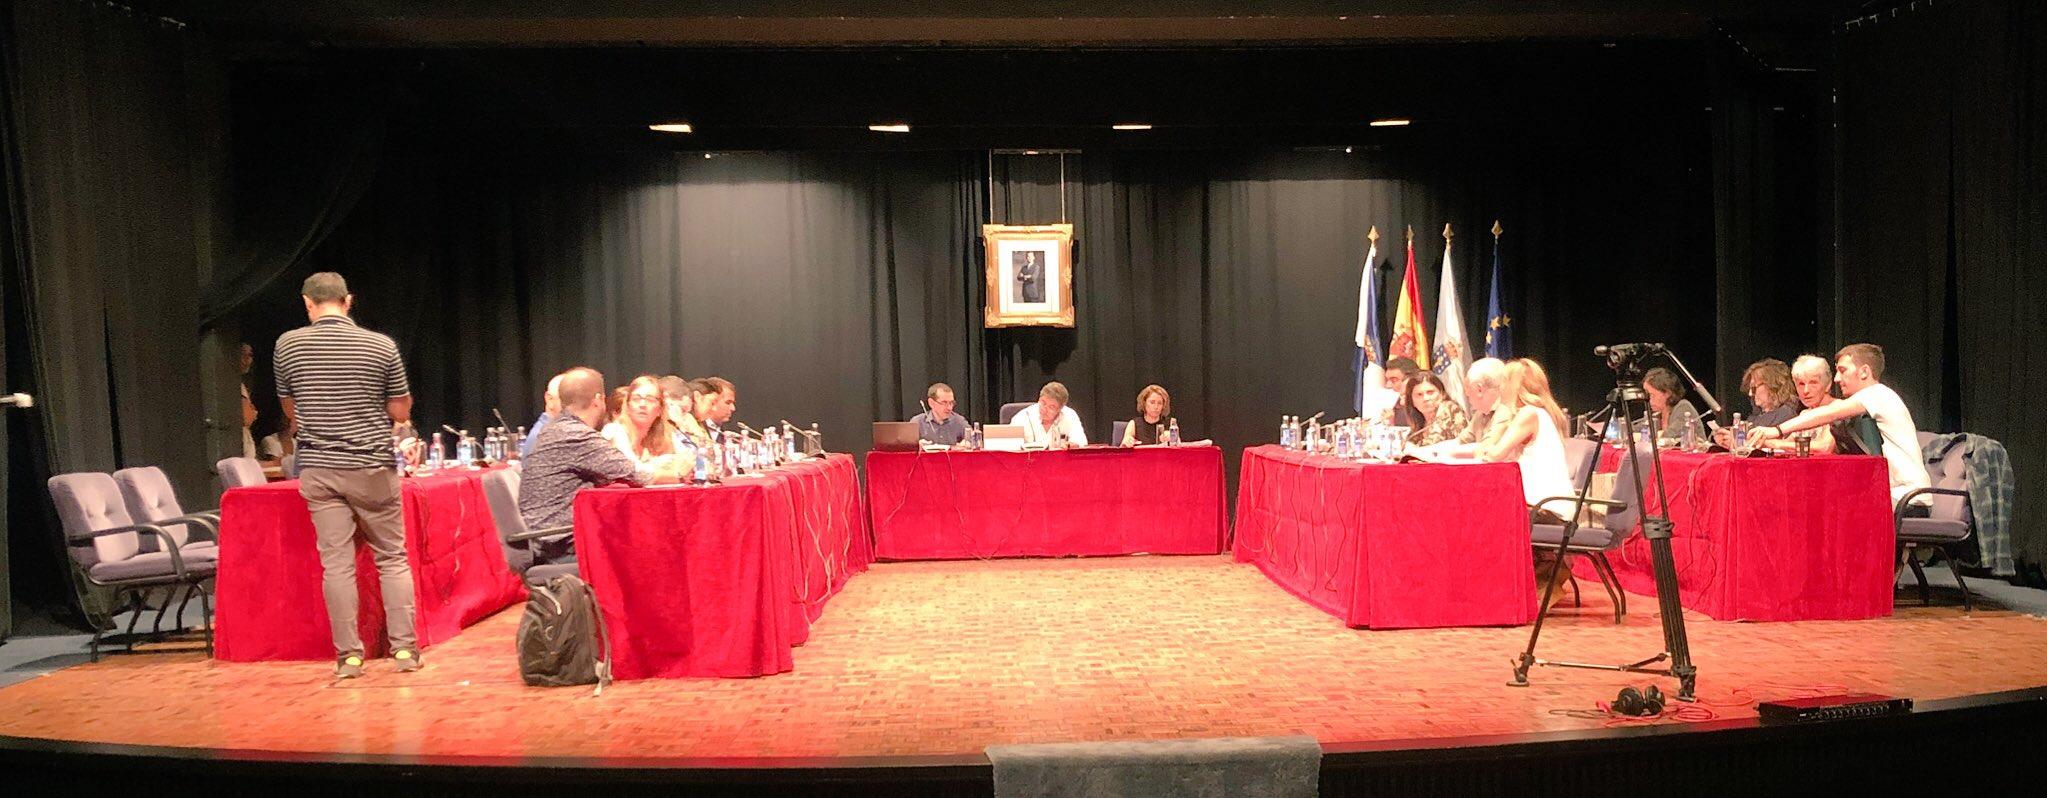 Pleno municipal Pontevedra